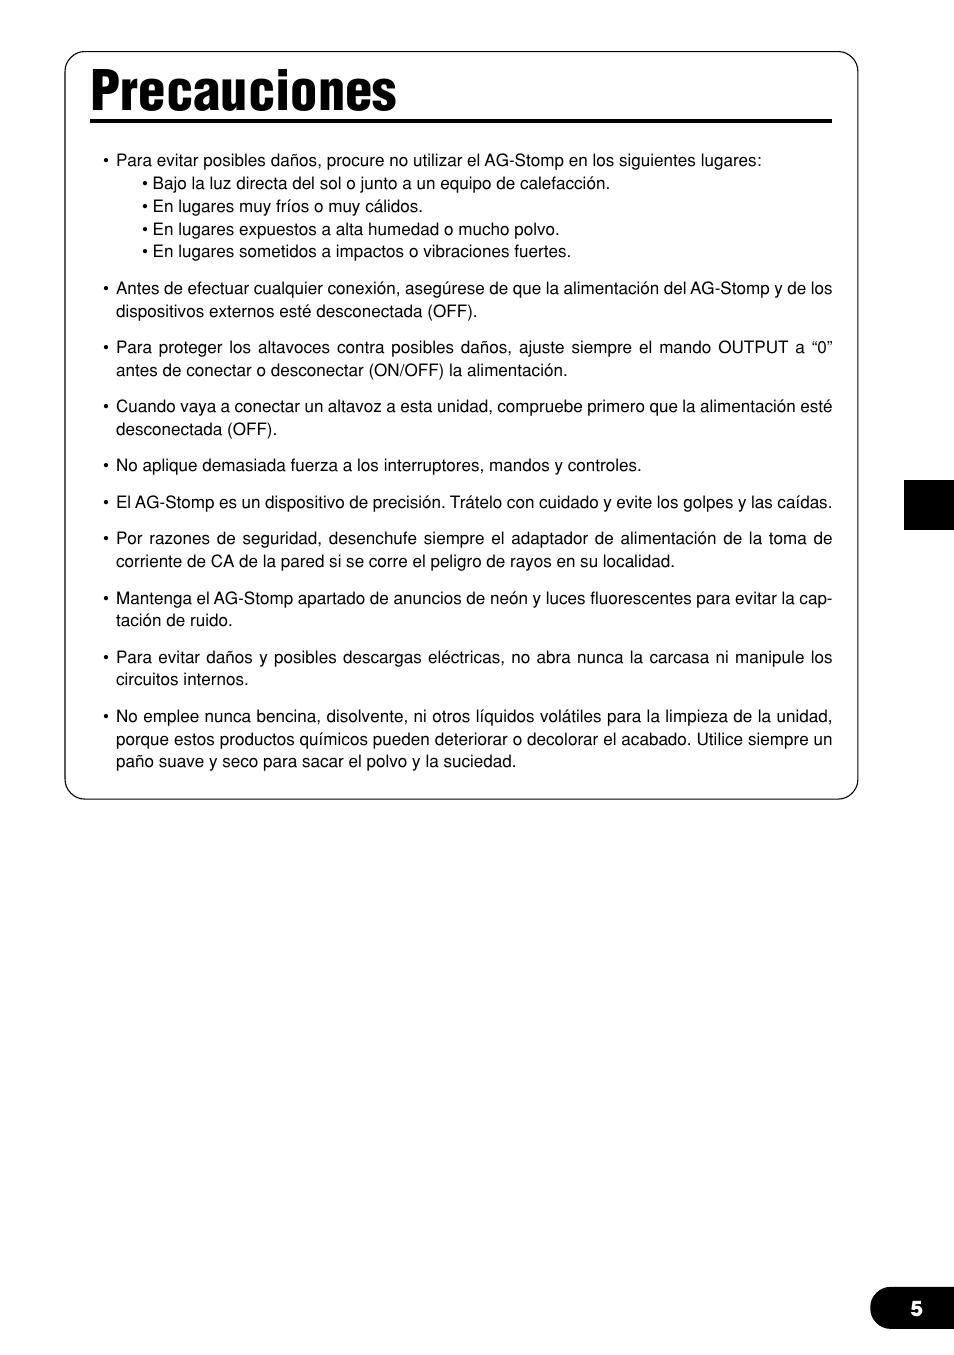 Precauciones | Yamaha AG-Stomp Manual del usuario | Página 5 / 32